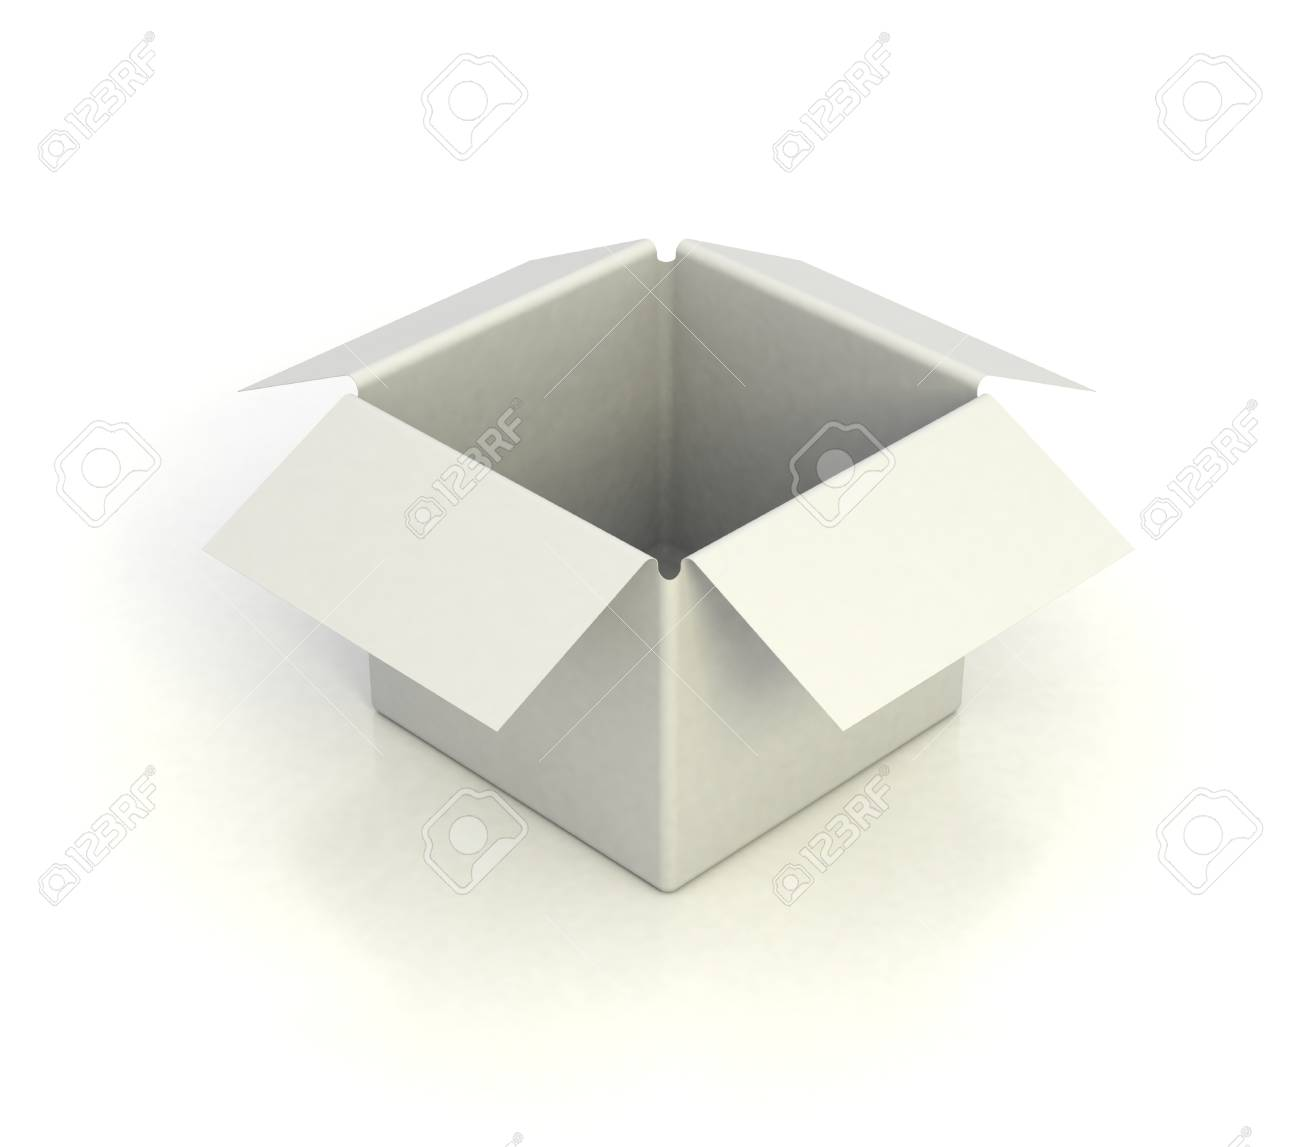 White empty box 3d illustration stock photo picture and royalty white empty box 3d illustration stock illustration 12331101 buycottarizona Gallery